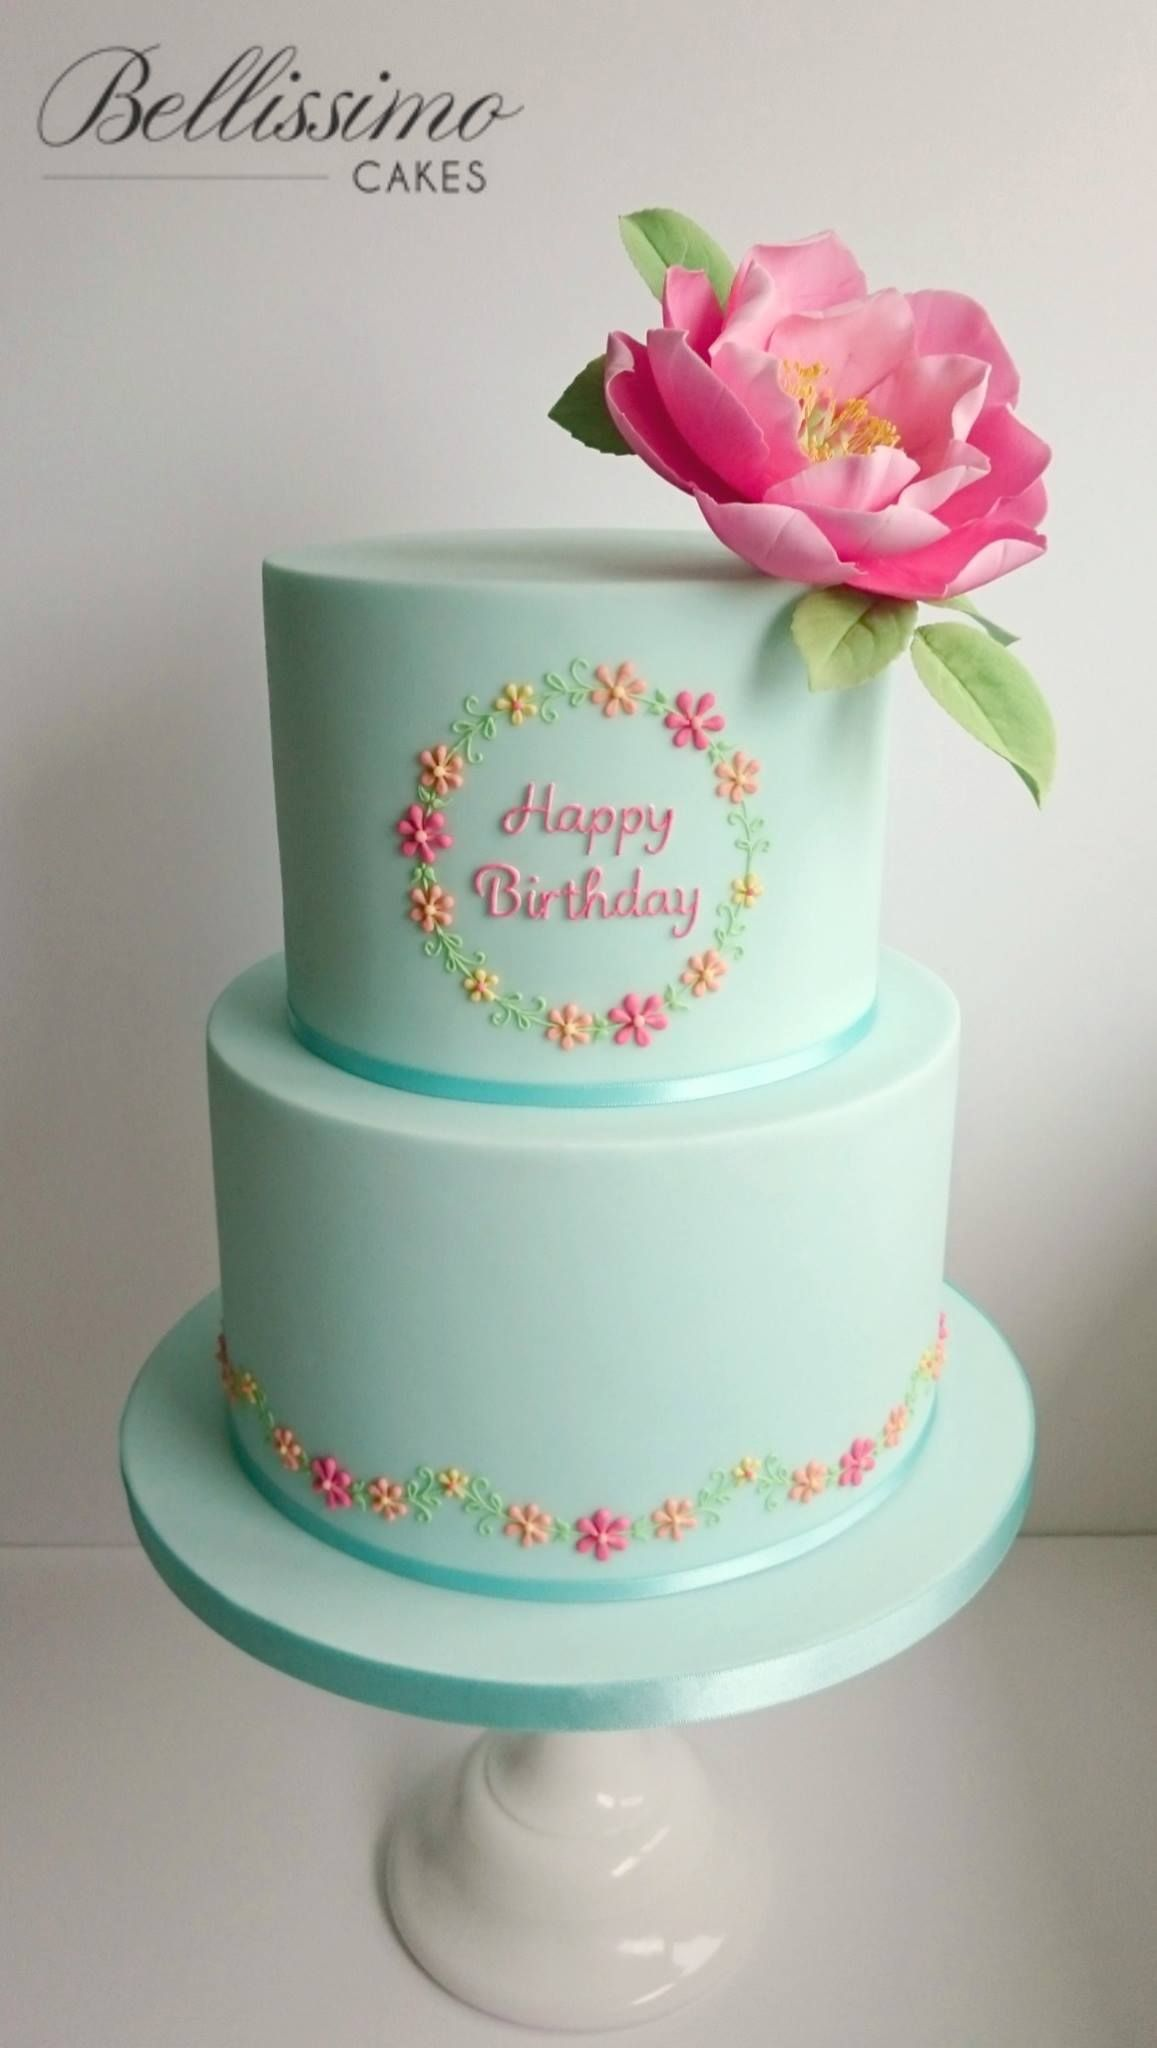 Happy Birthday To My Mum Linda Who Celebrates A Bellissimo